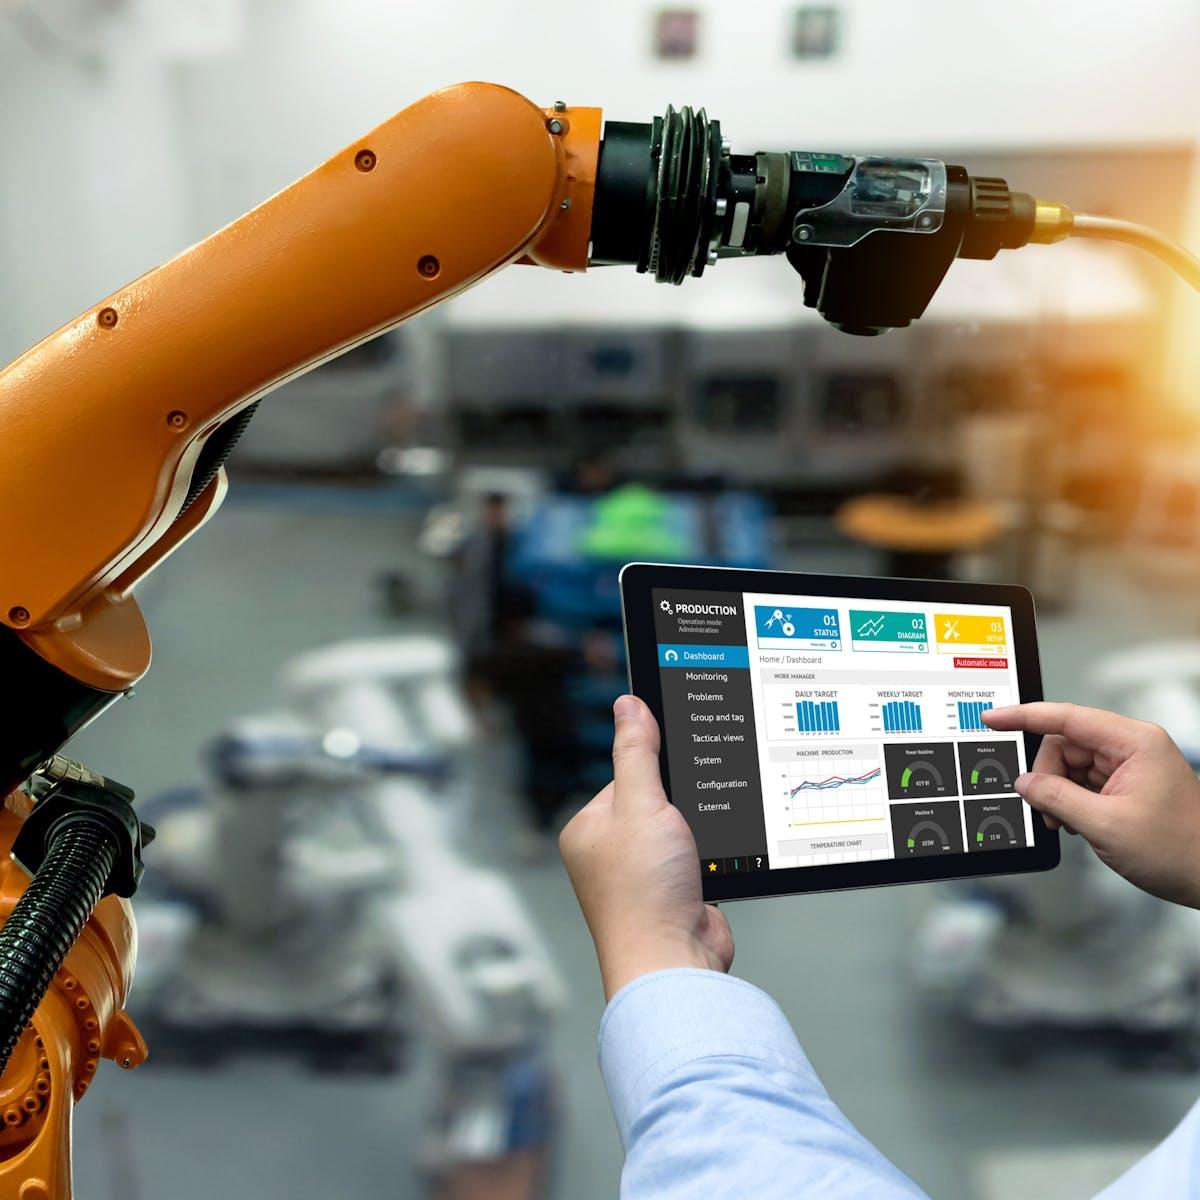 Titelbild-Roboter-Arm-Produktion-Tablet-OSRAM-iStock-803972362